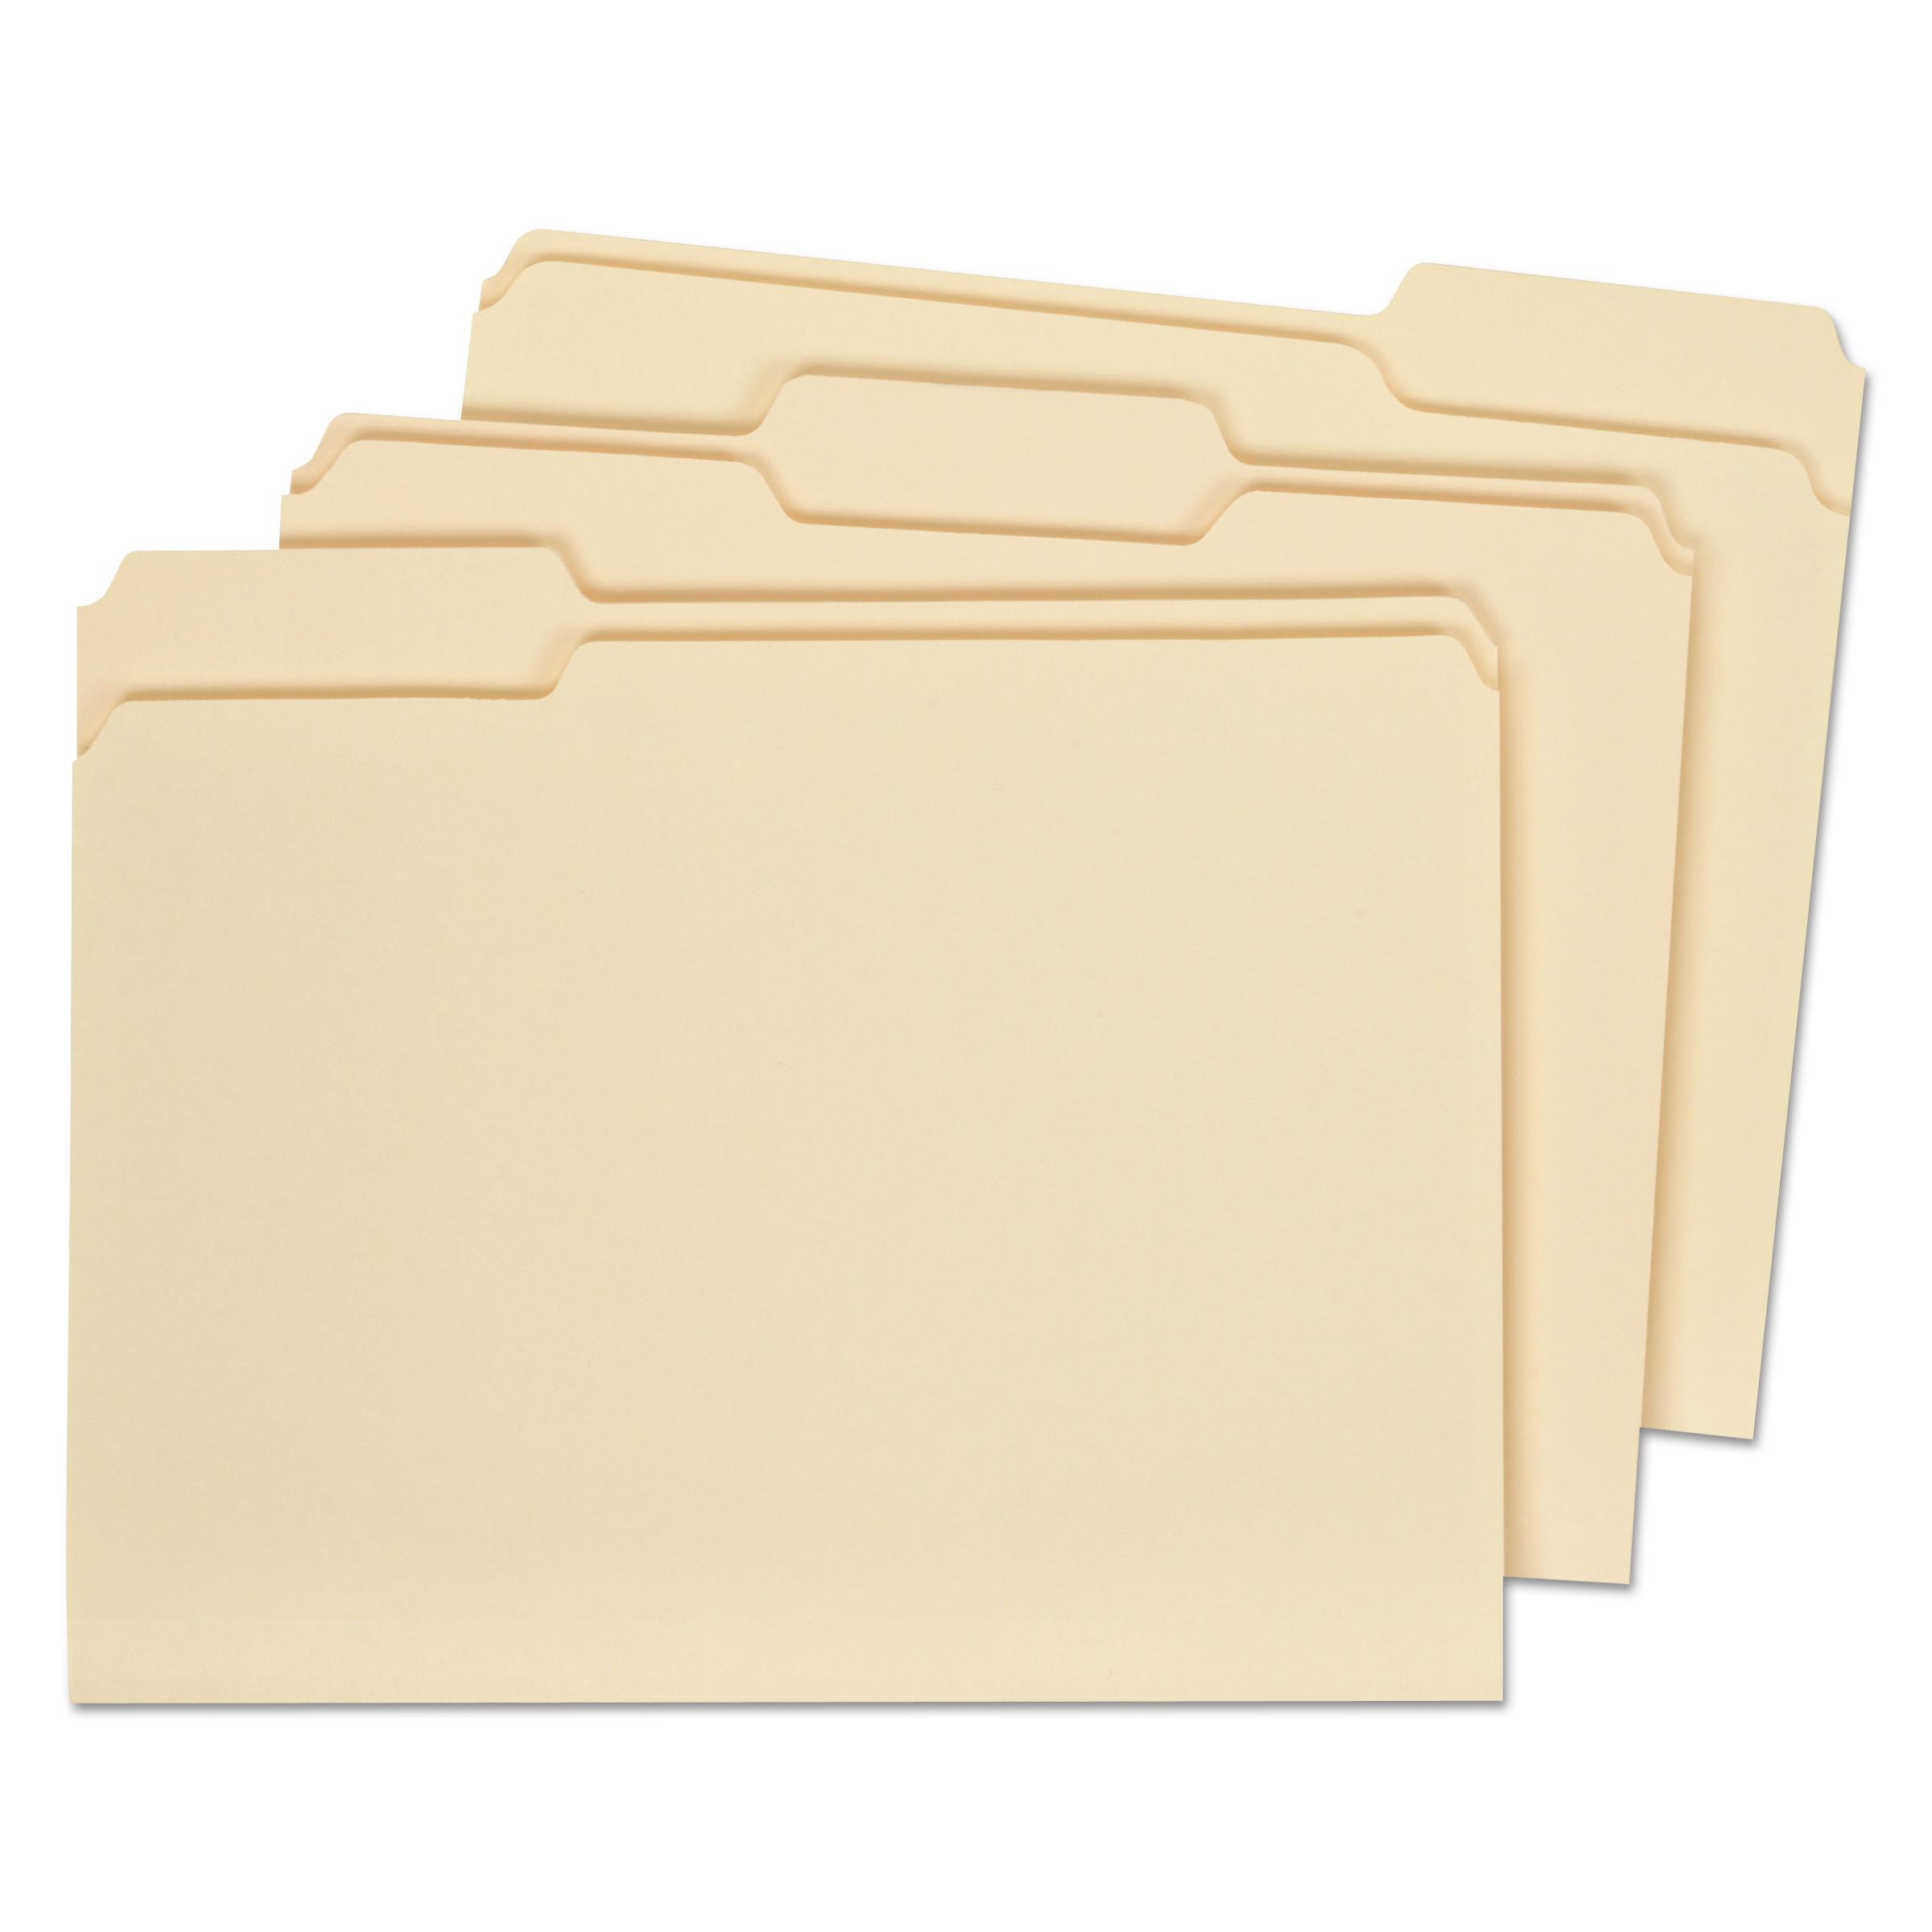 Double-Ply Top Tab Manila File Folders, 1/3-Cut Tabs, Letter Size, 100/Box